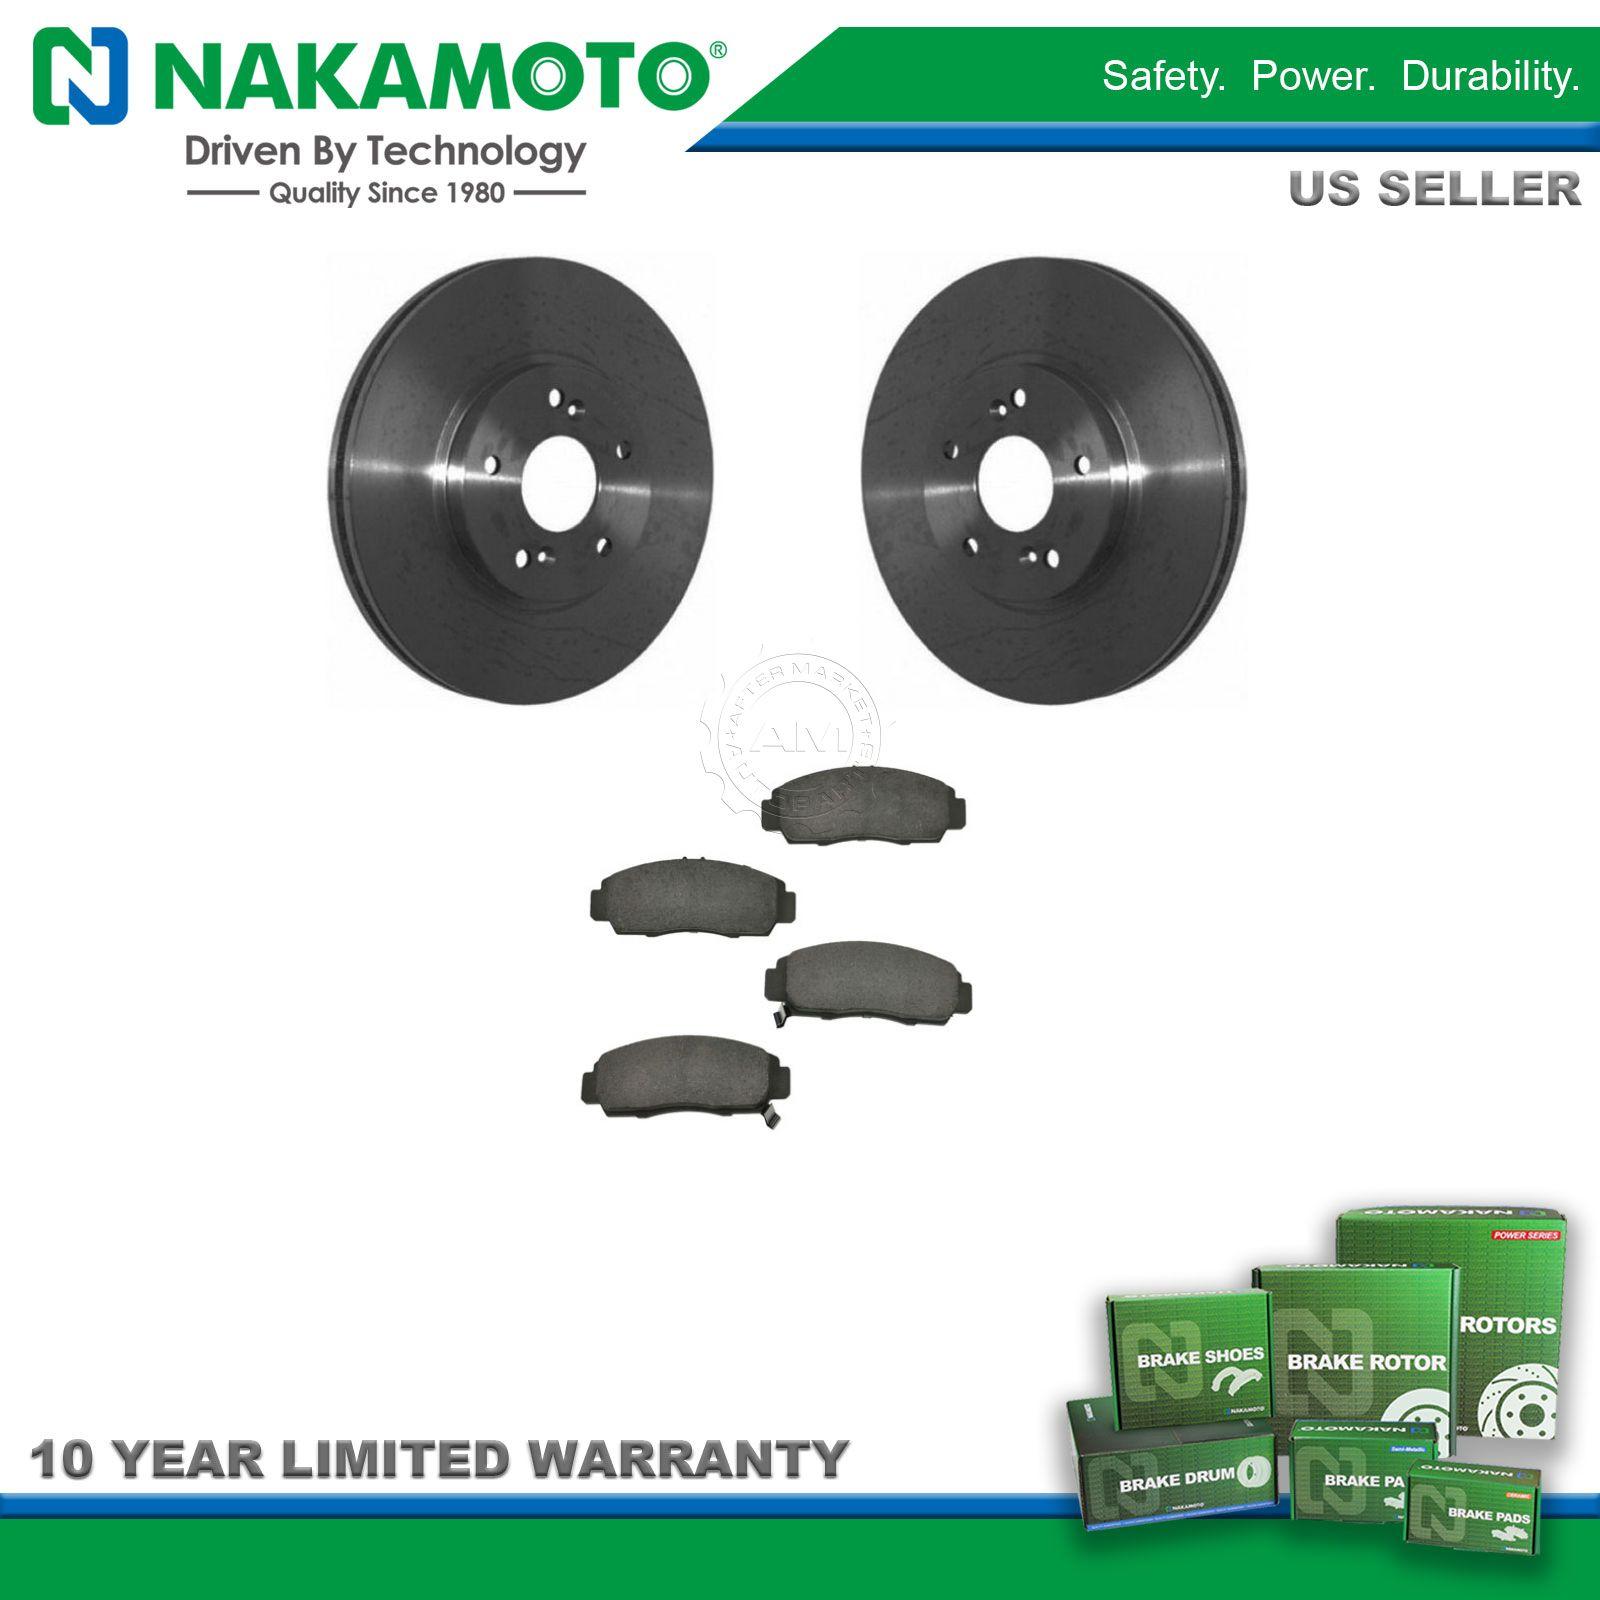 Nakamoto Front Premium Posi Ceramic Brake Pad & Rotor Kit for TL CL TSX  Accord